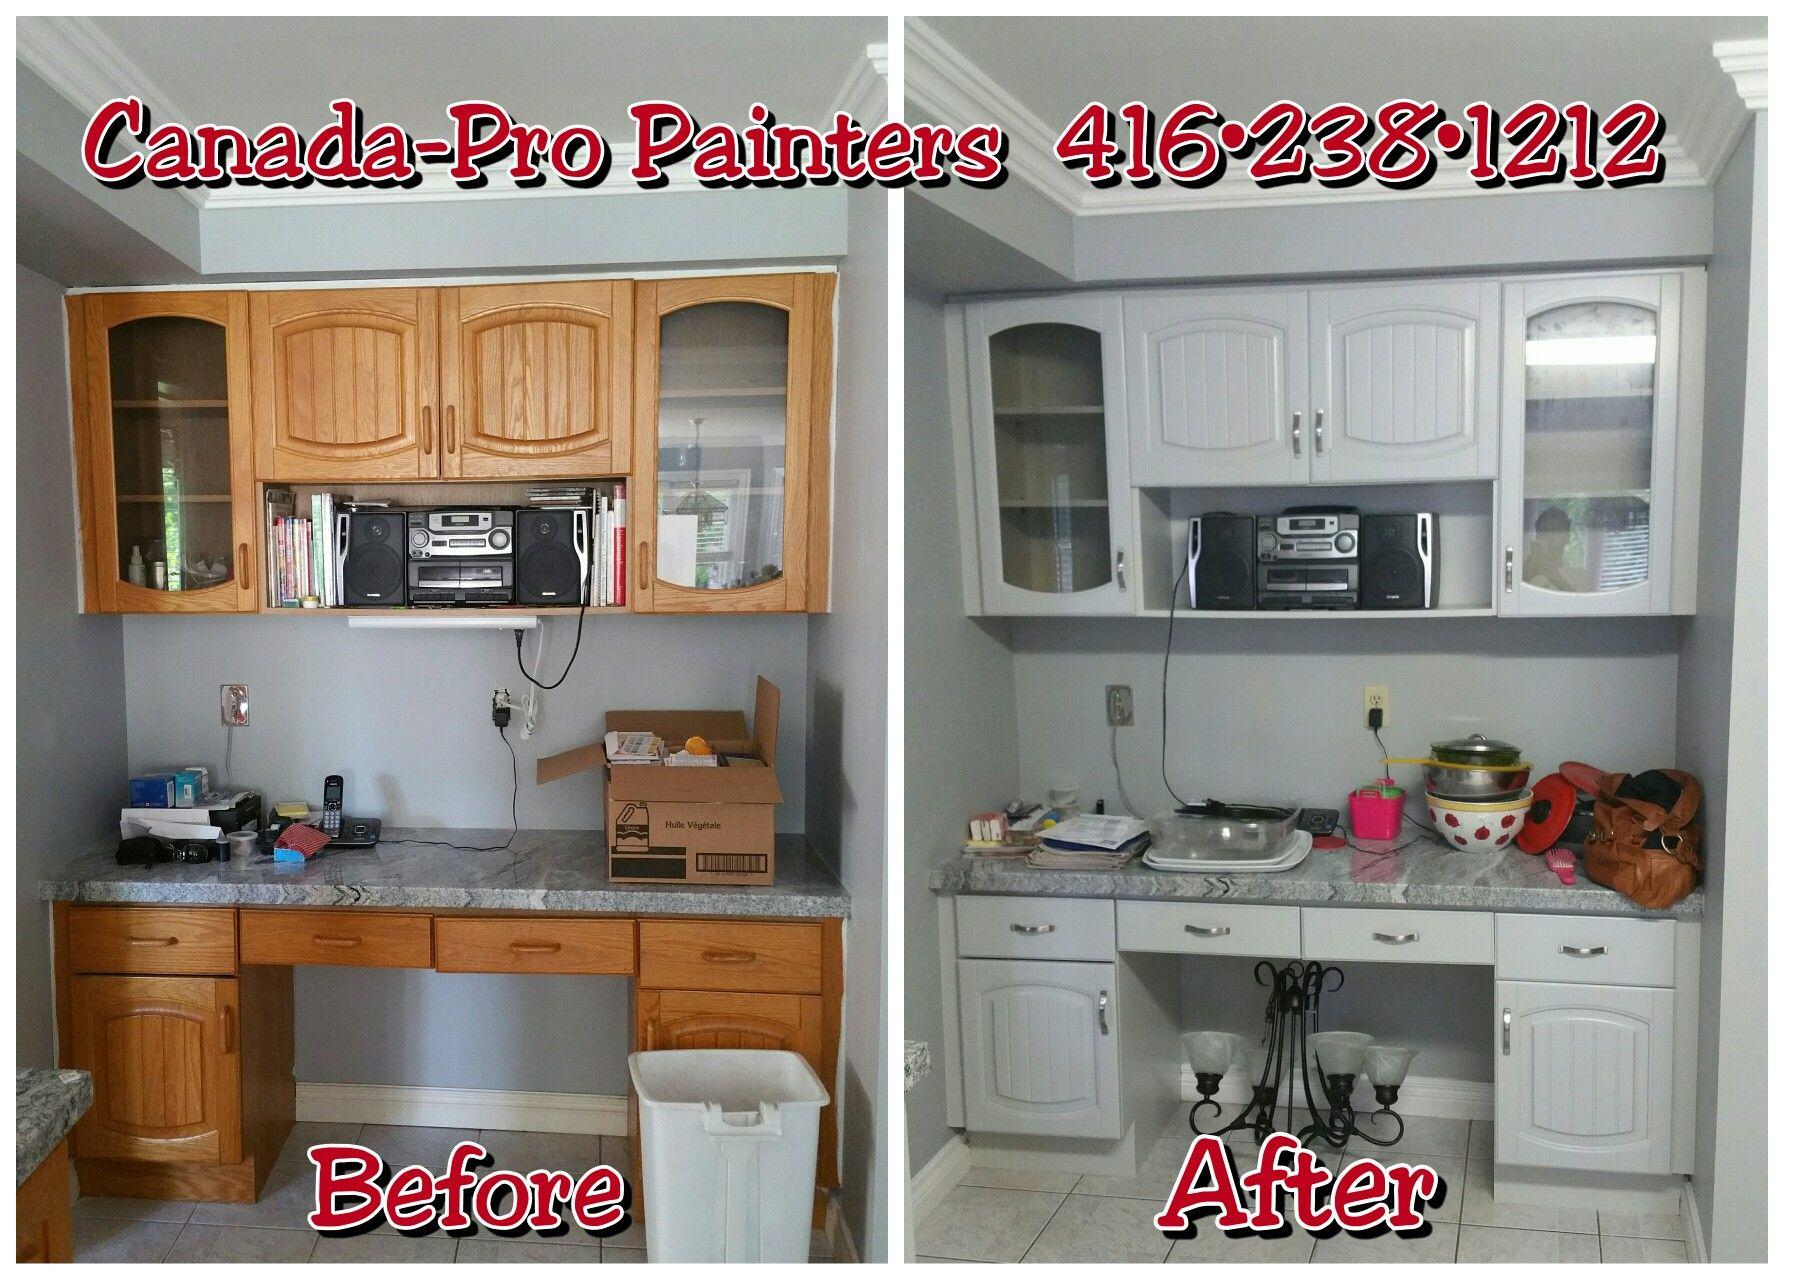 Oak kitchen cabinets painted Benjamin Moore HC-170 ...